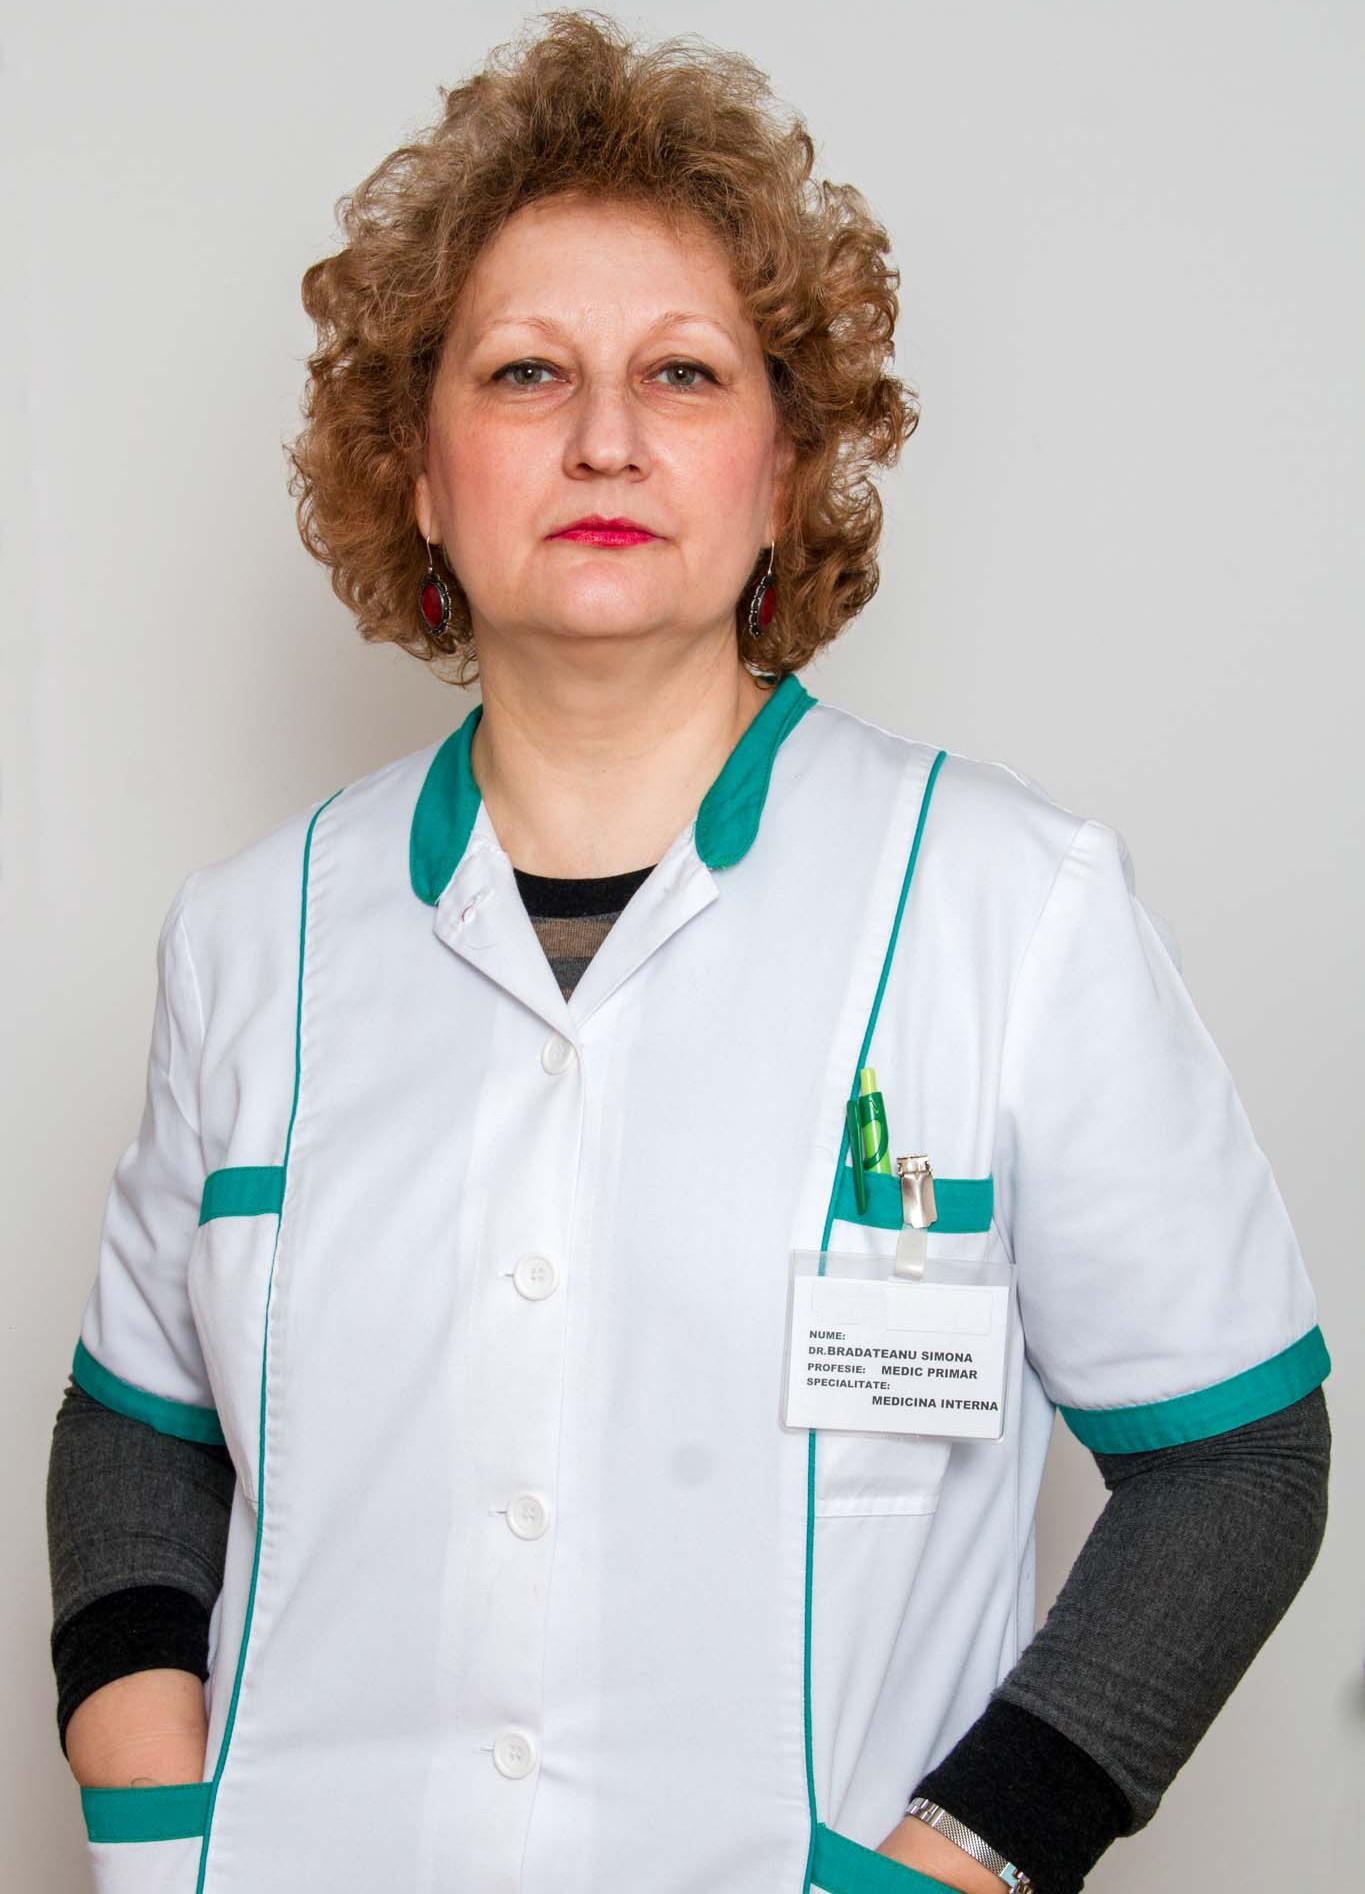 Dr. Simona  Bradateanu